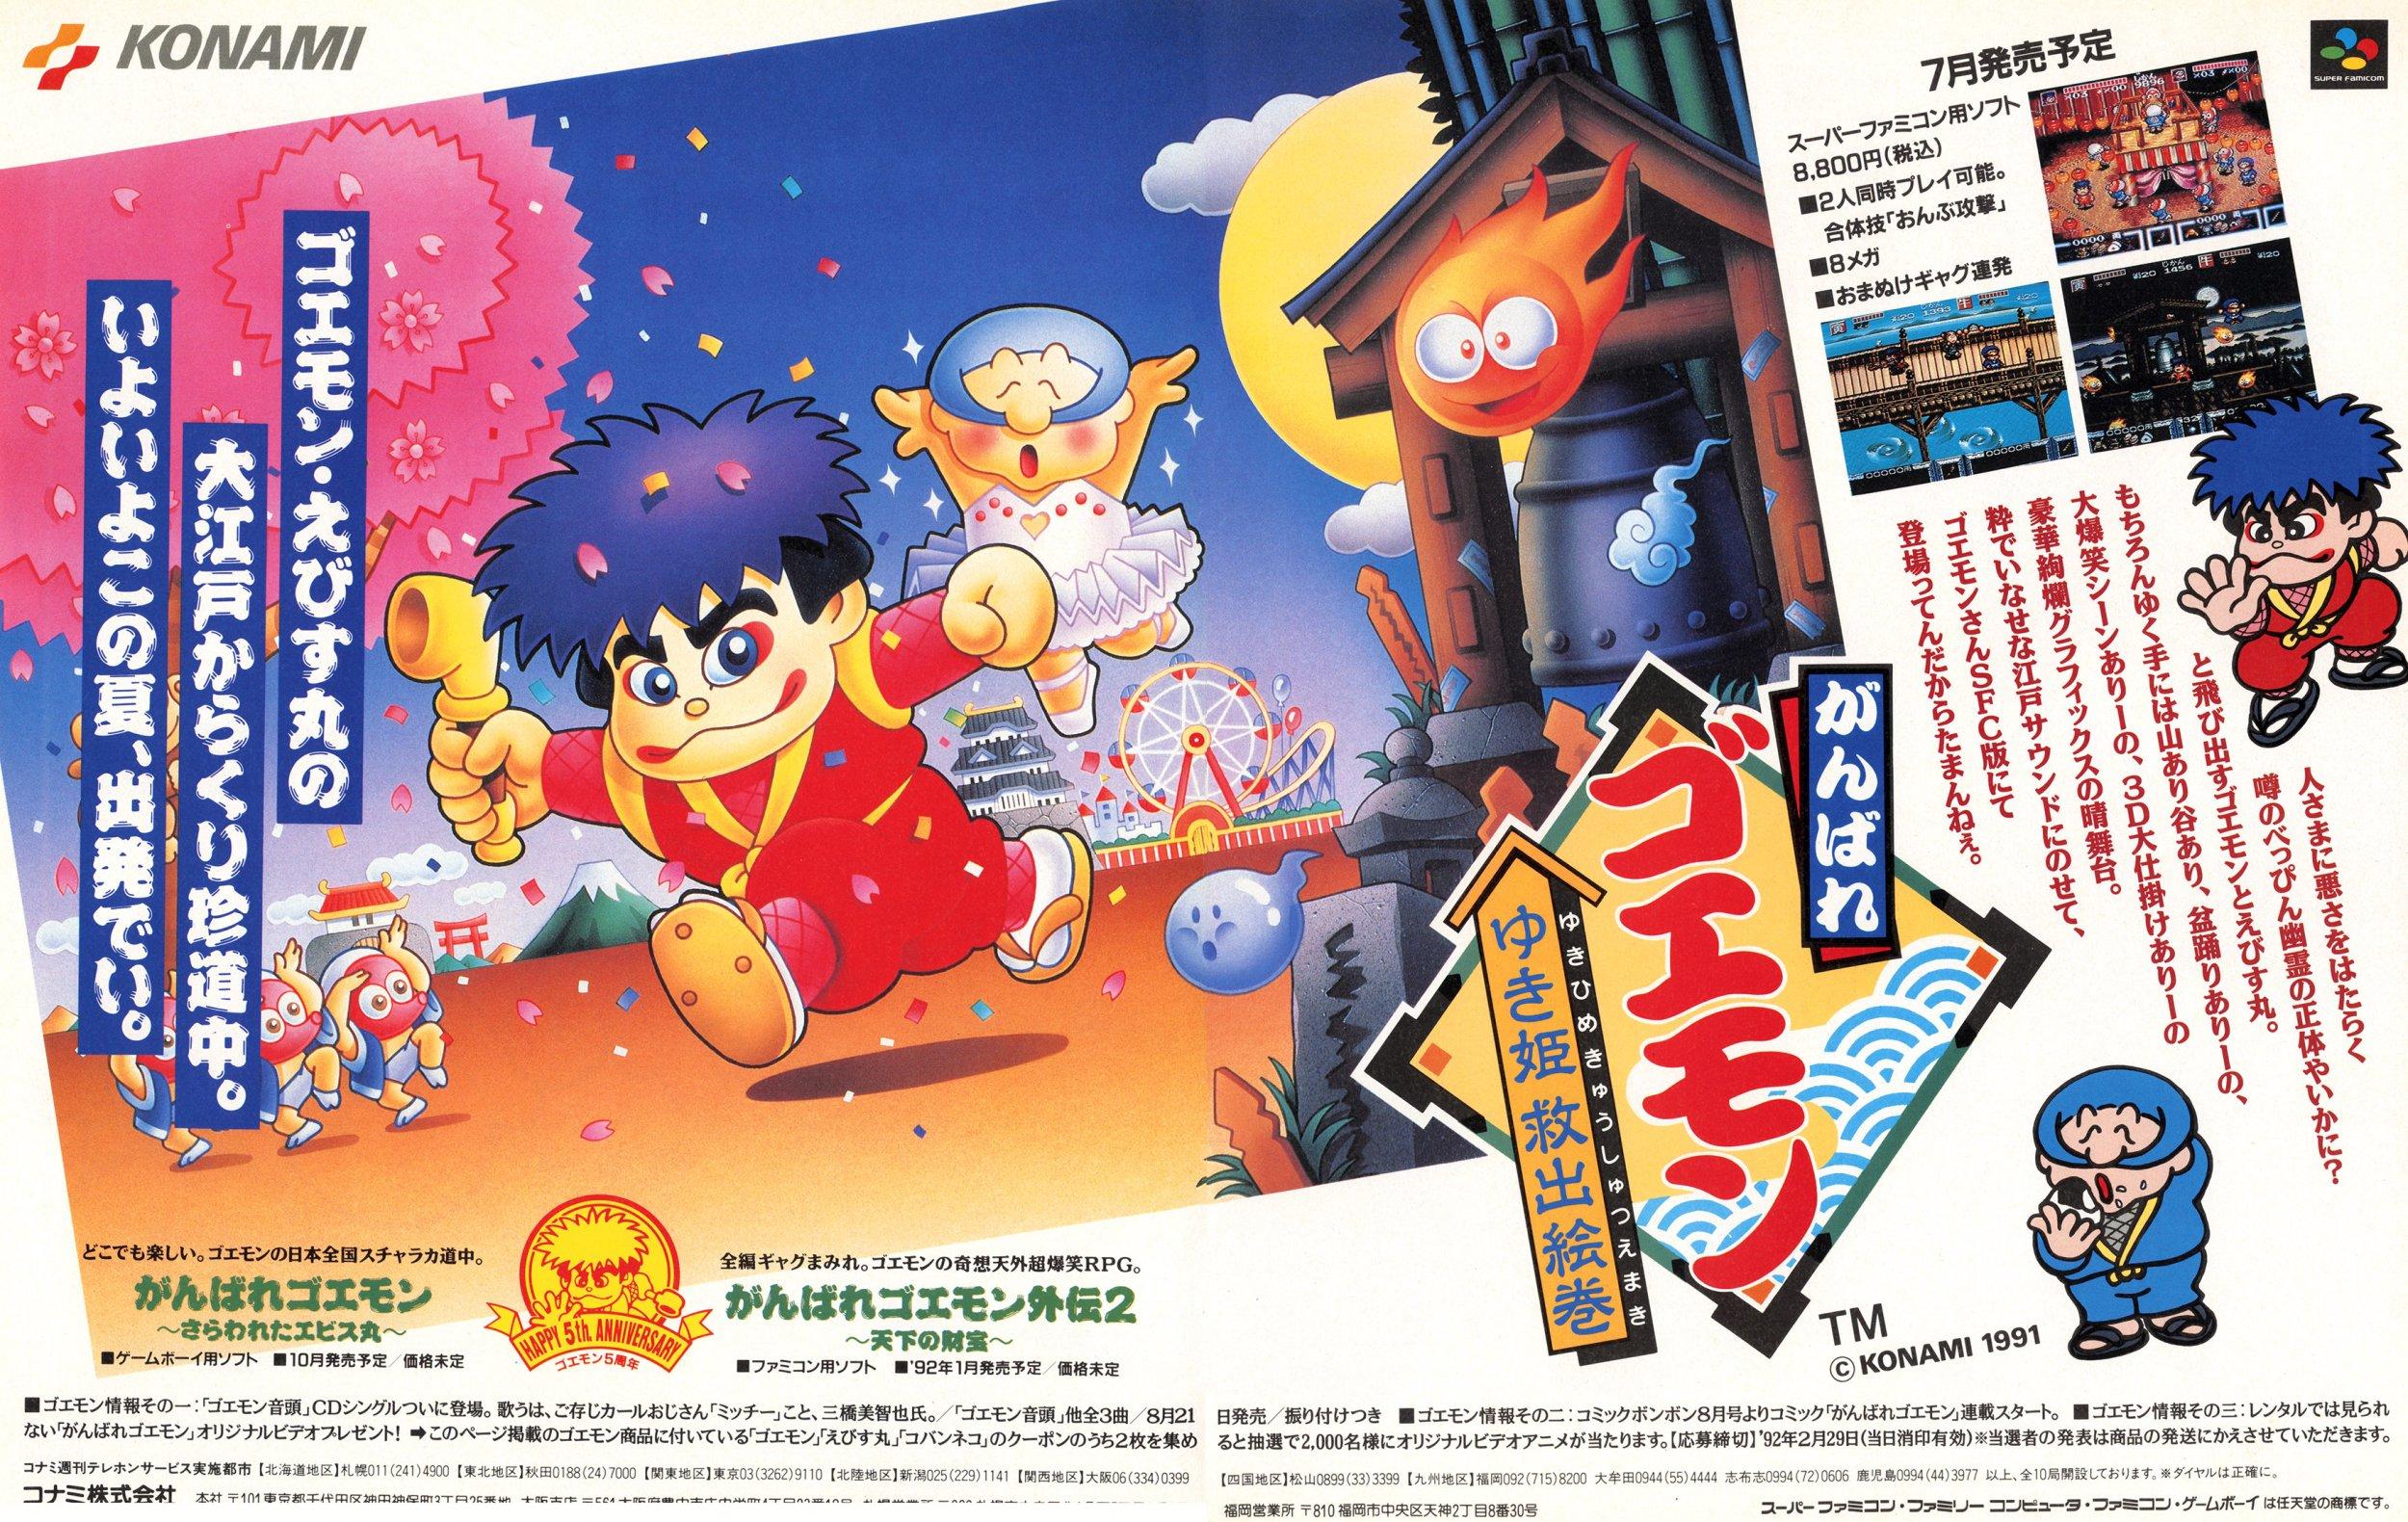 Legend of the Mystical Ninja, The (Ganbare Goemon: Yukihime Kyūshutsu Emaki) (Japan)